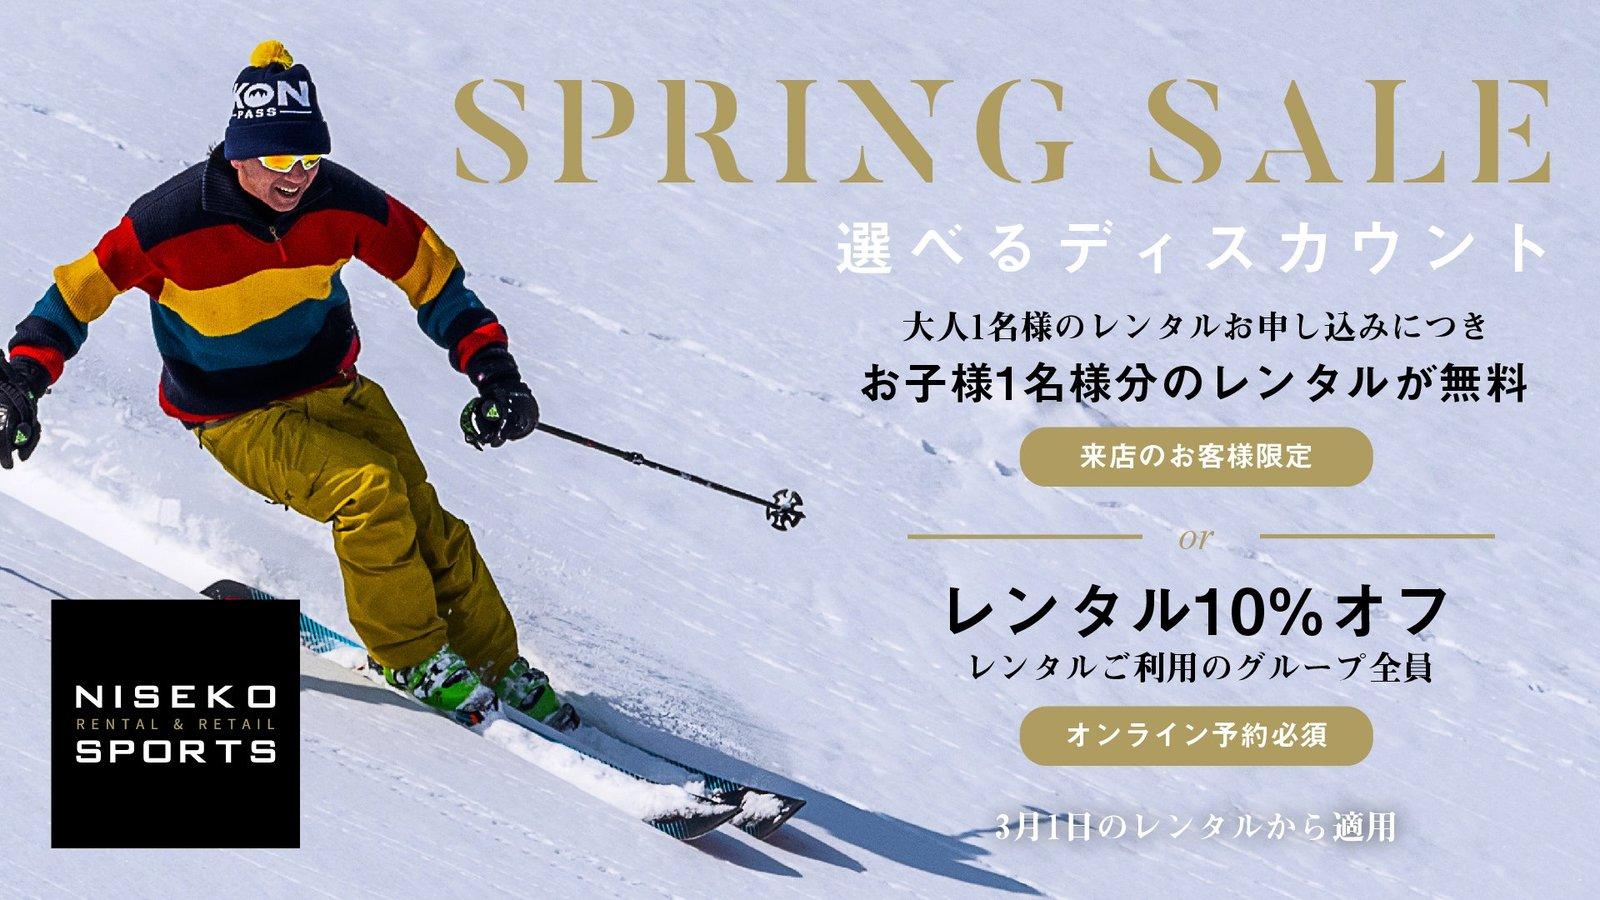 niseko-sports-spring-sale